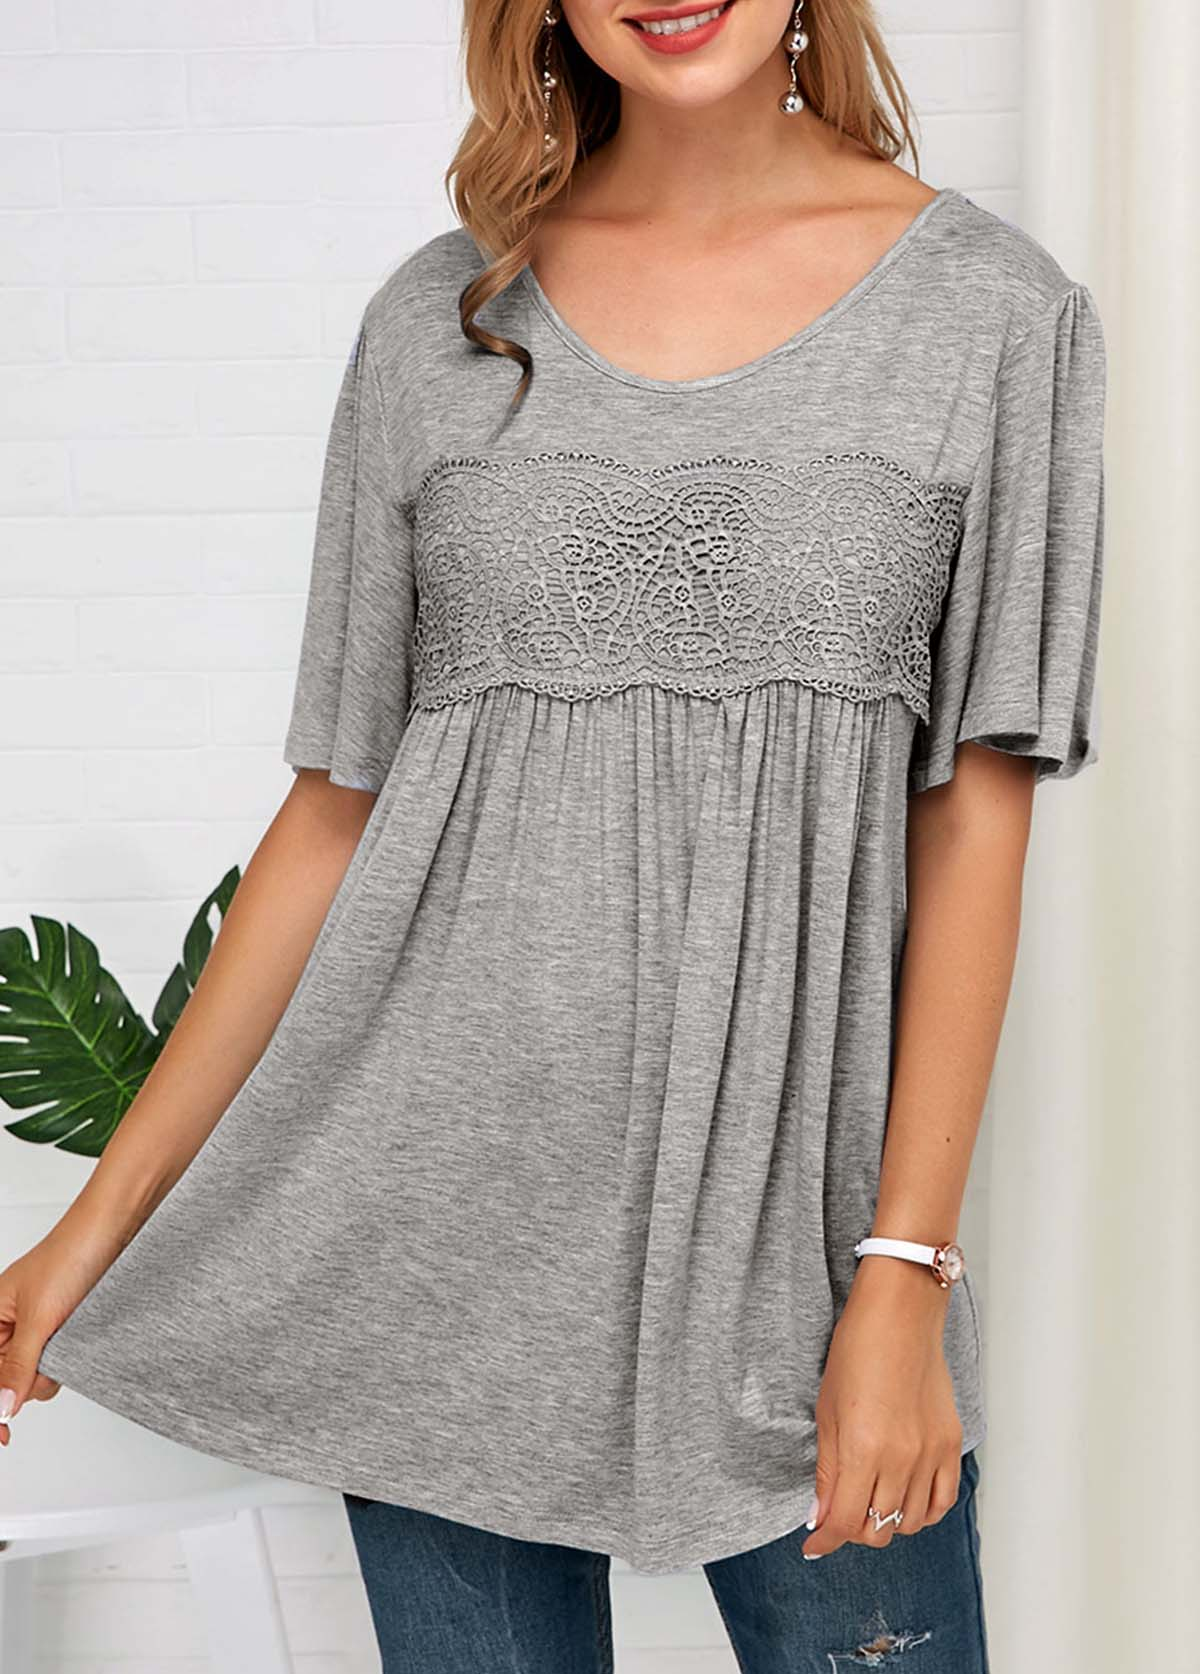 ROTITA Grey Lace Panel Half Sleeve Soft T Shirt